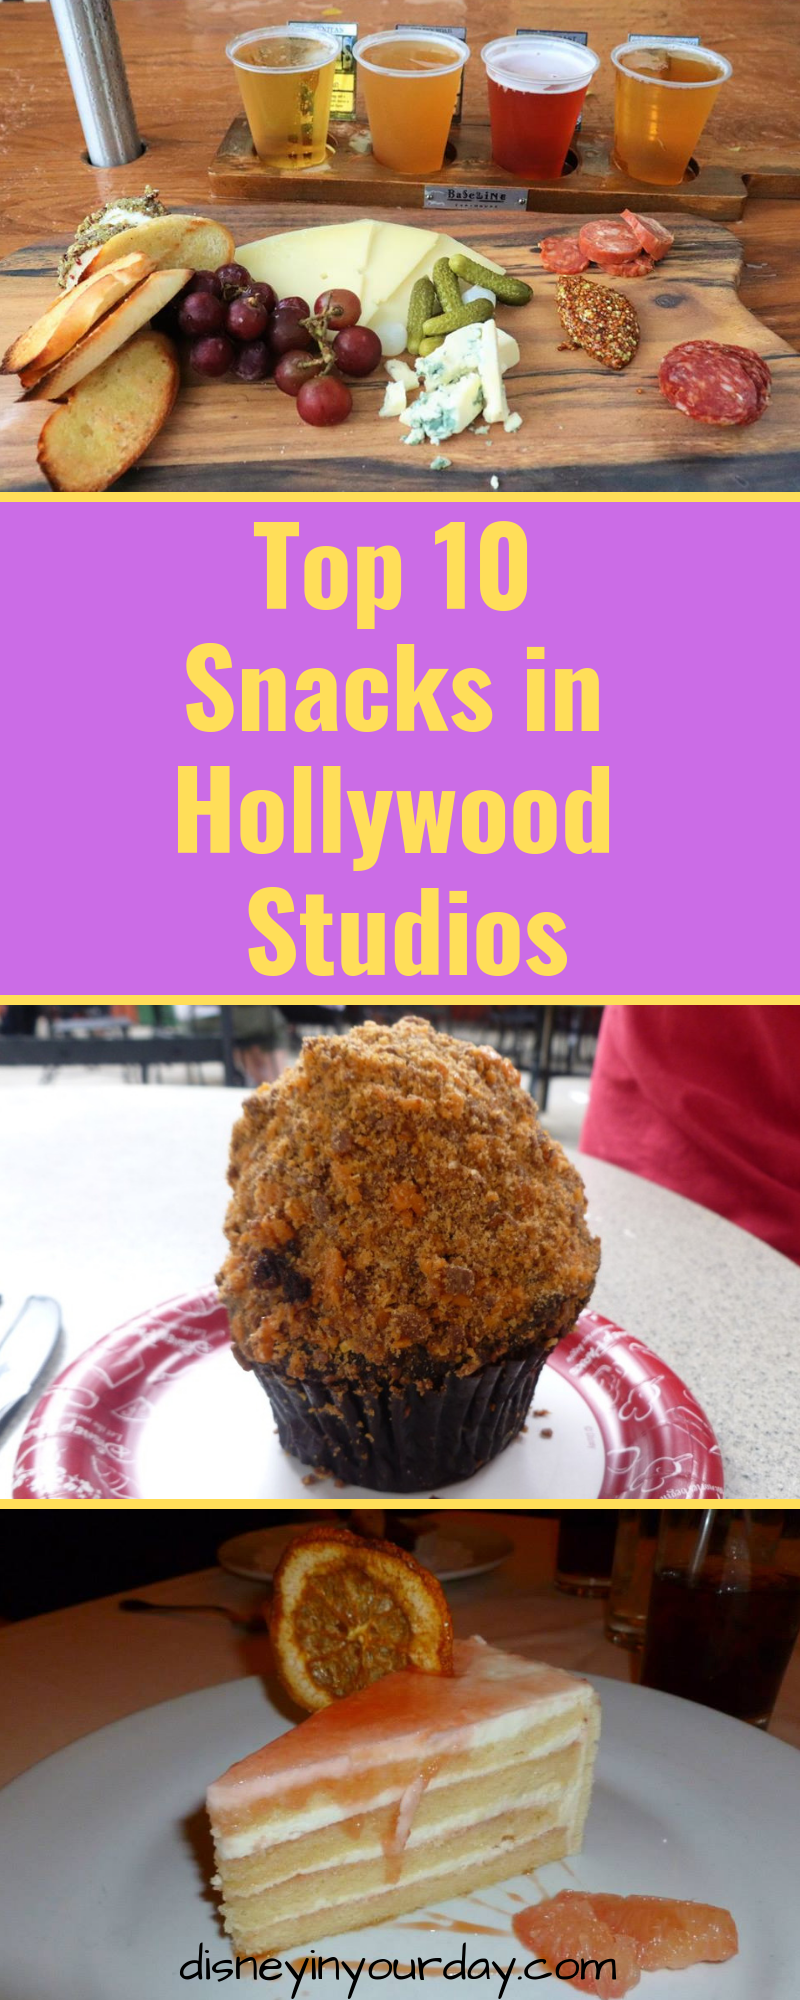 snacks in Hollywood Studios - Disney in your Day